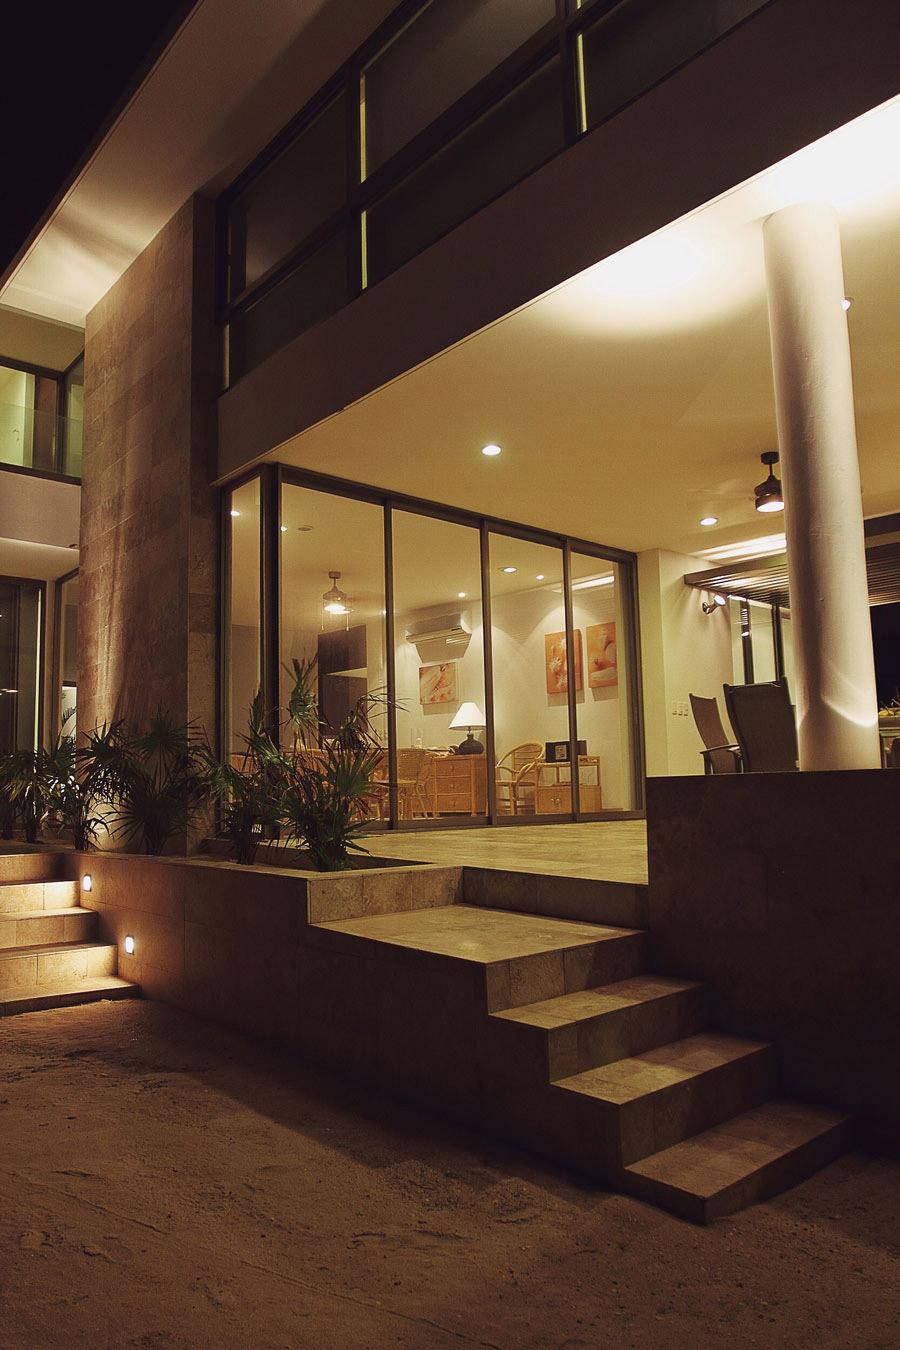 Terrace, Steps, Tuunich Kanab in San Bruno, Mexico by Seijo Peon Arquitectos